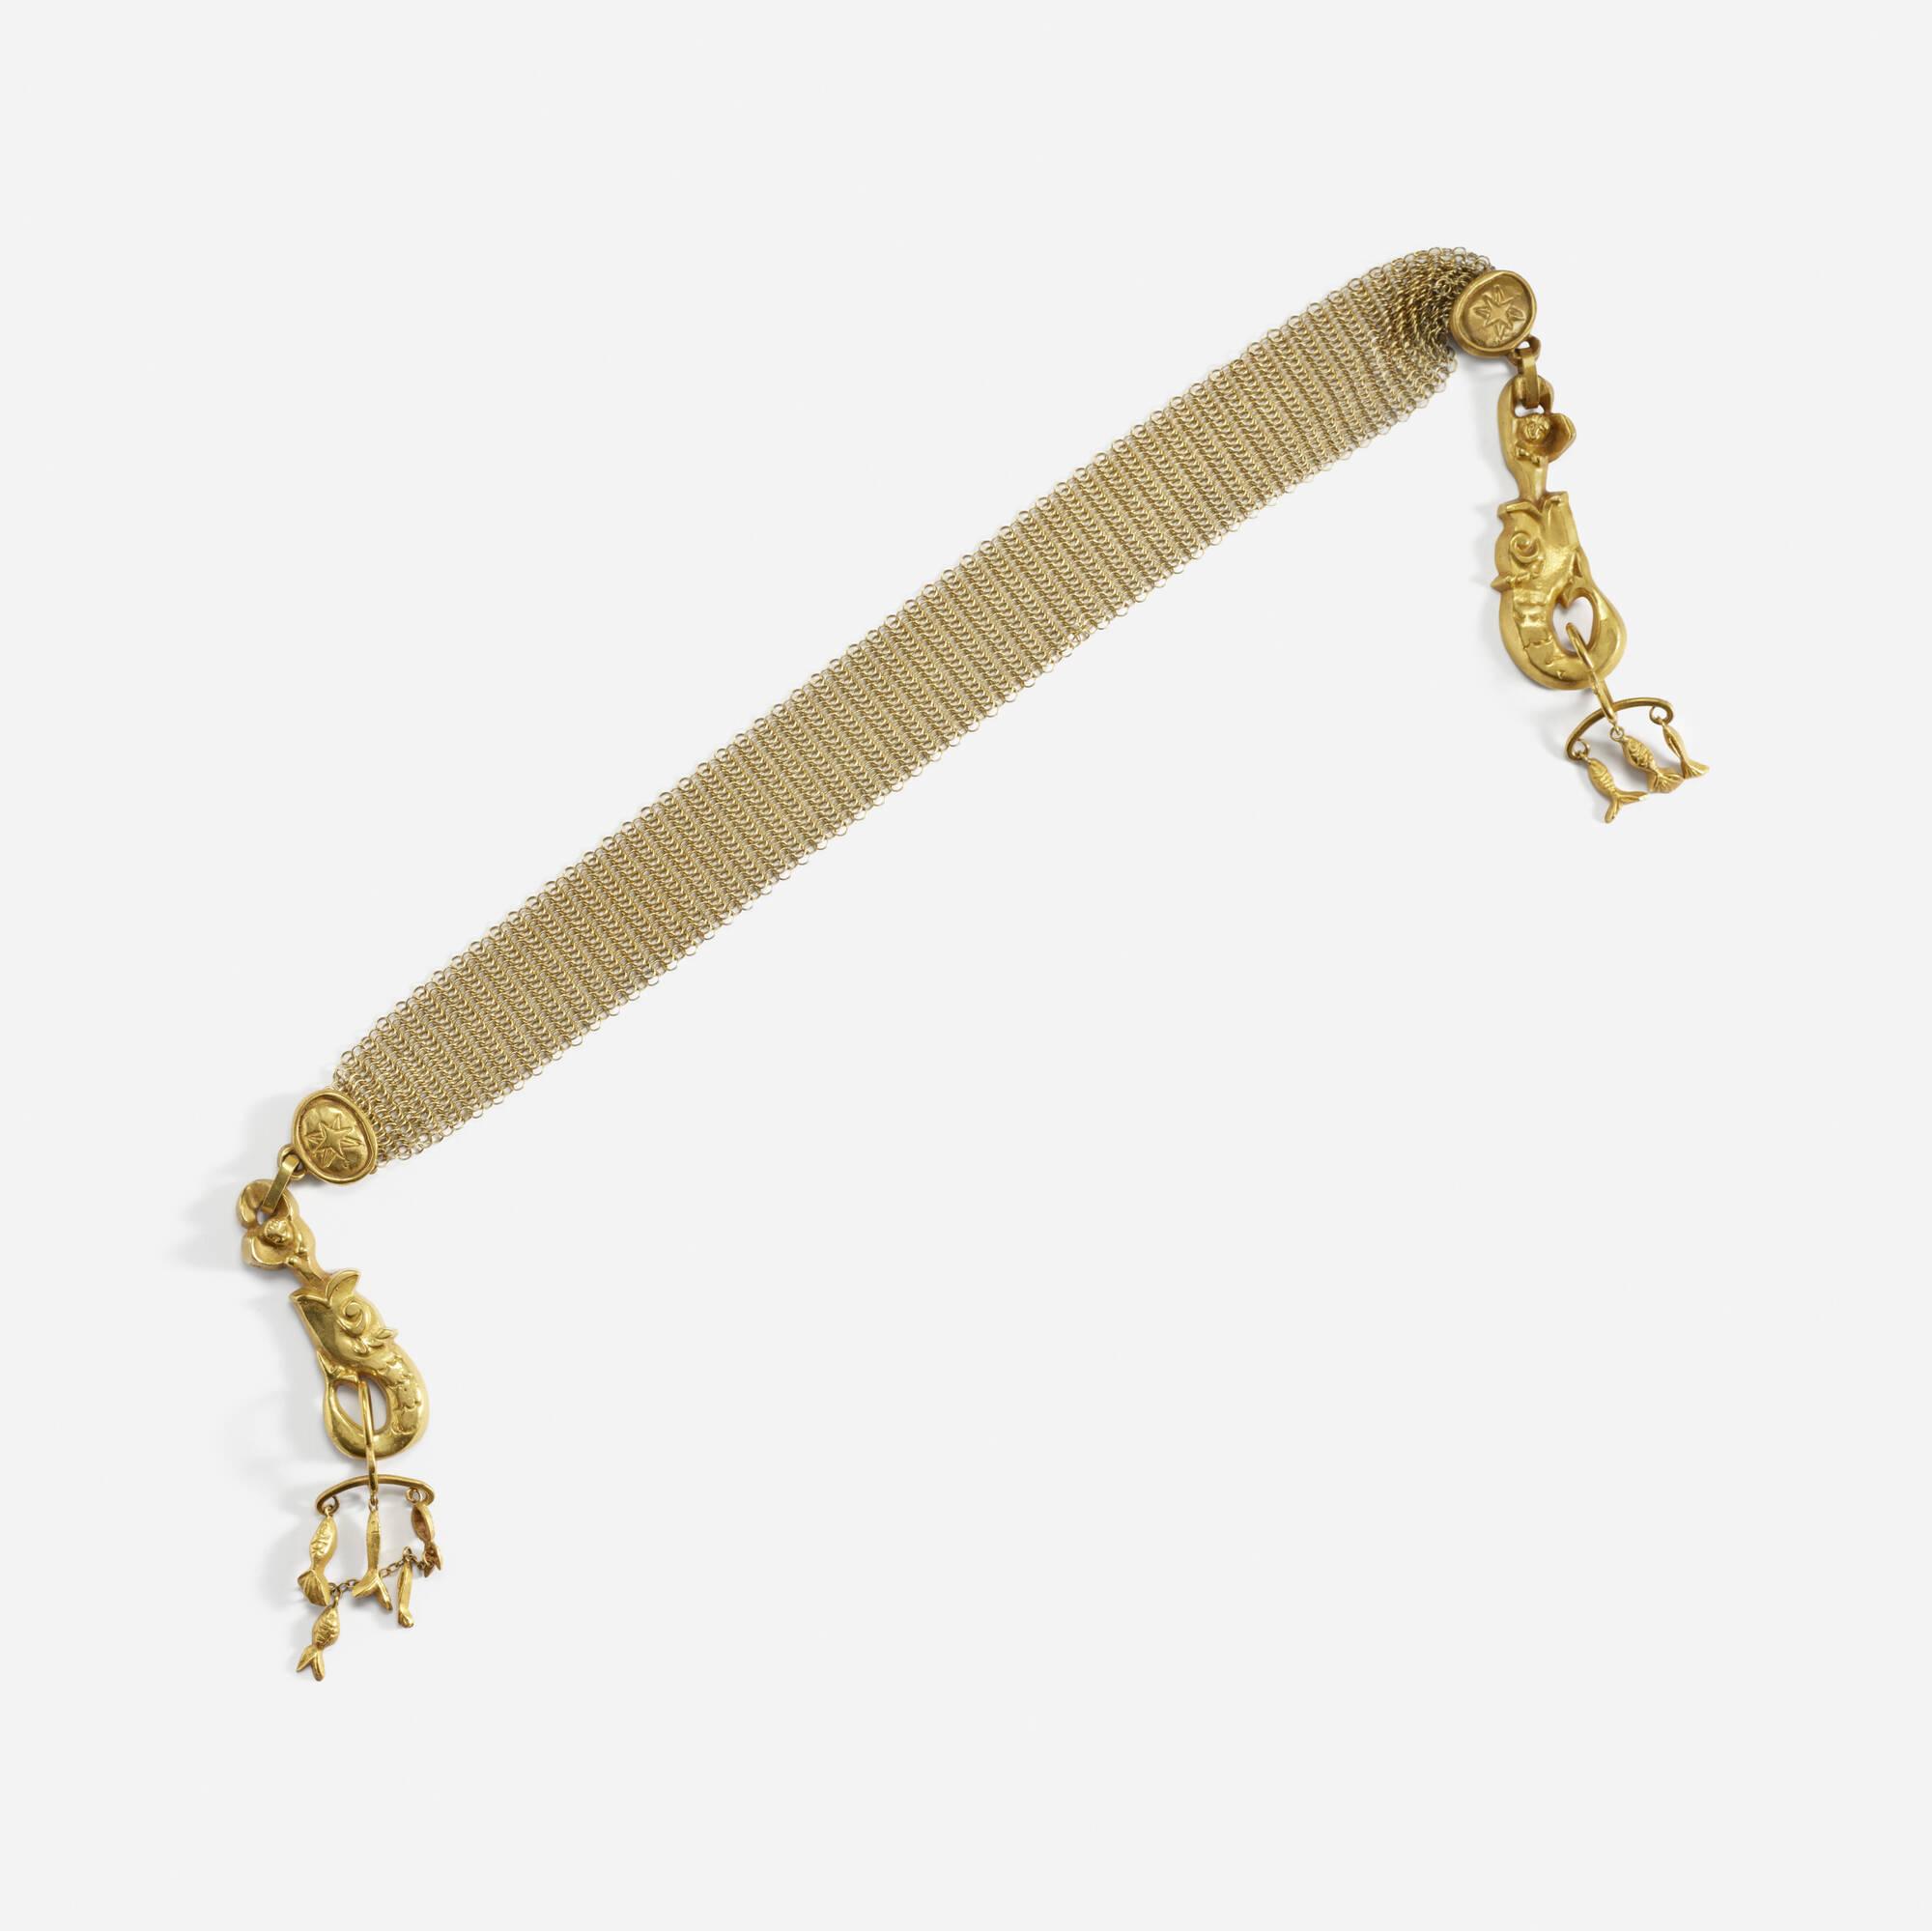 273: Line Vautrin / La Peche Mirauleuse necklace (2 of 3)